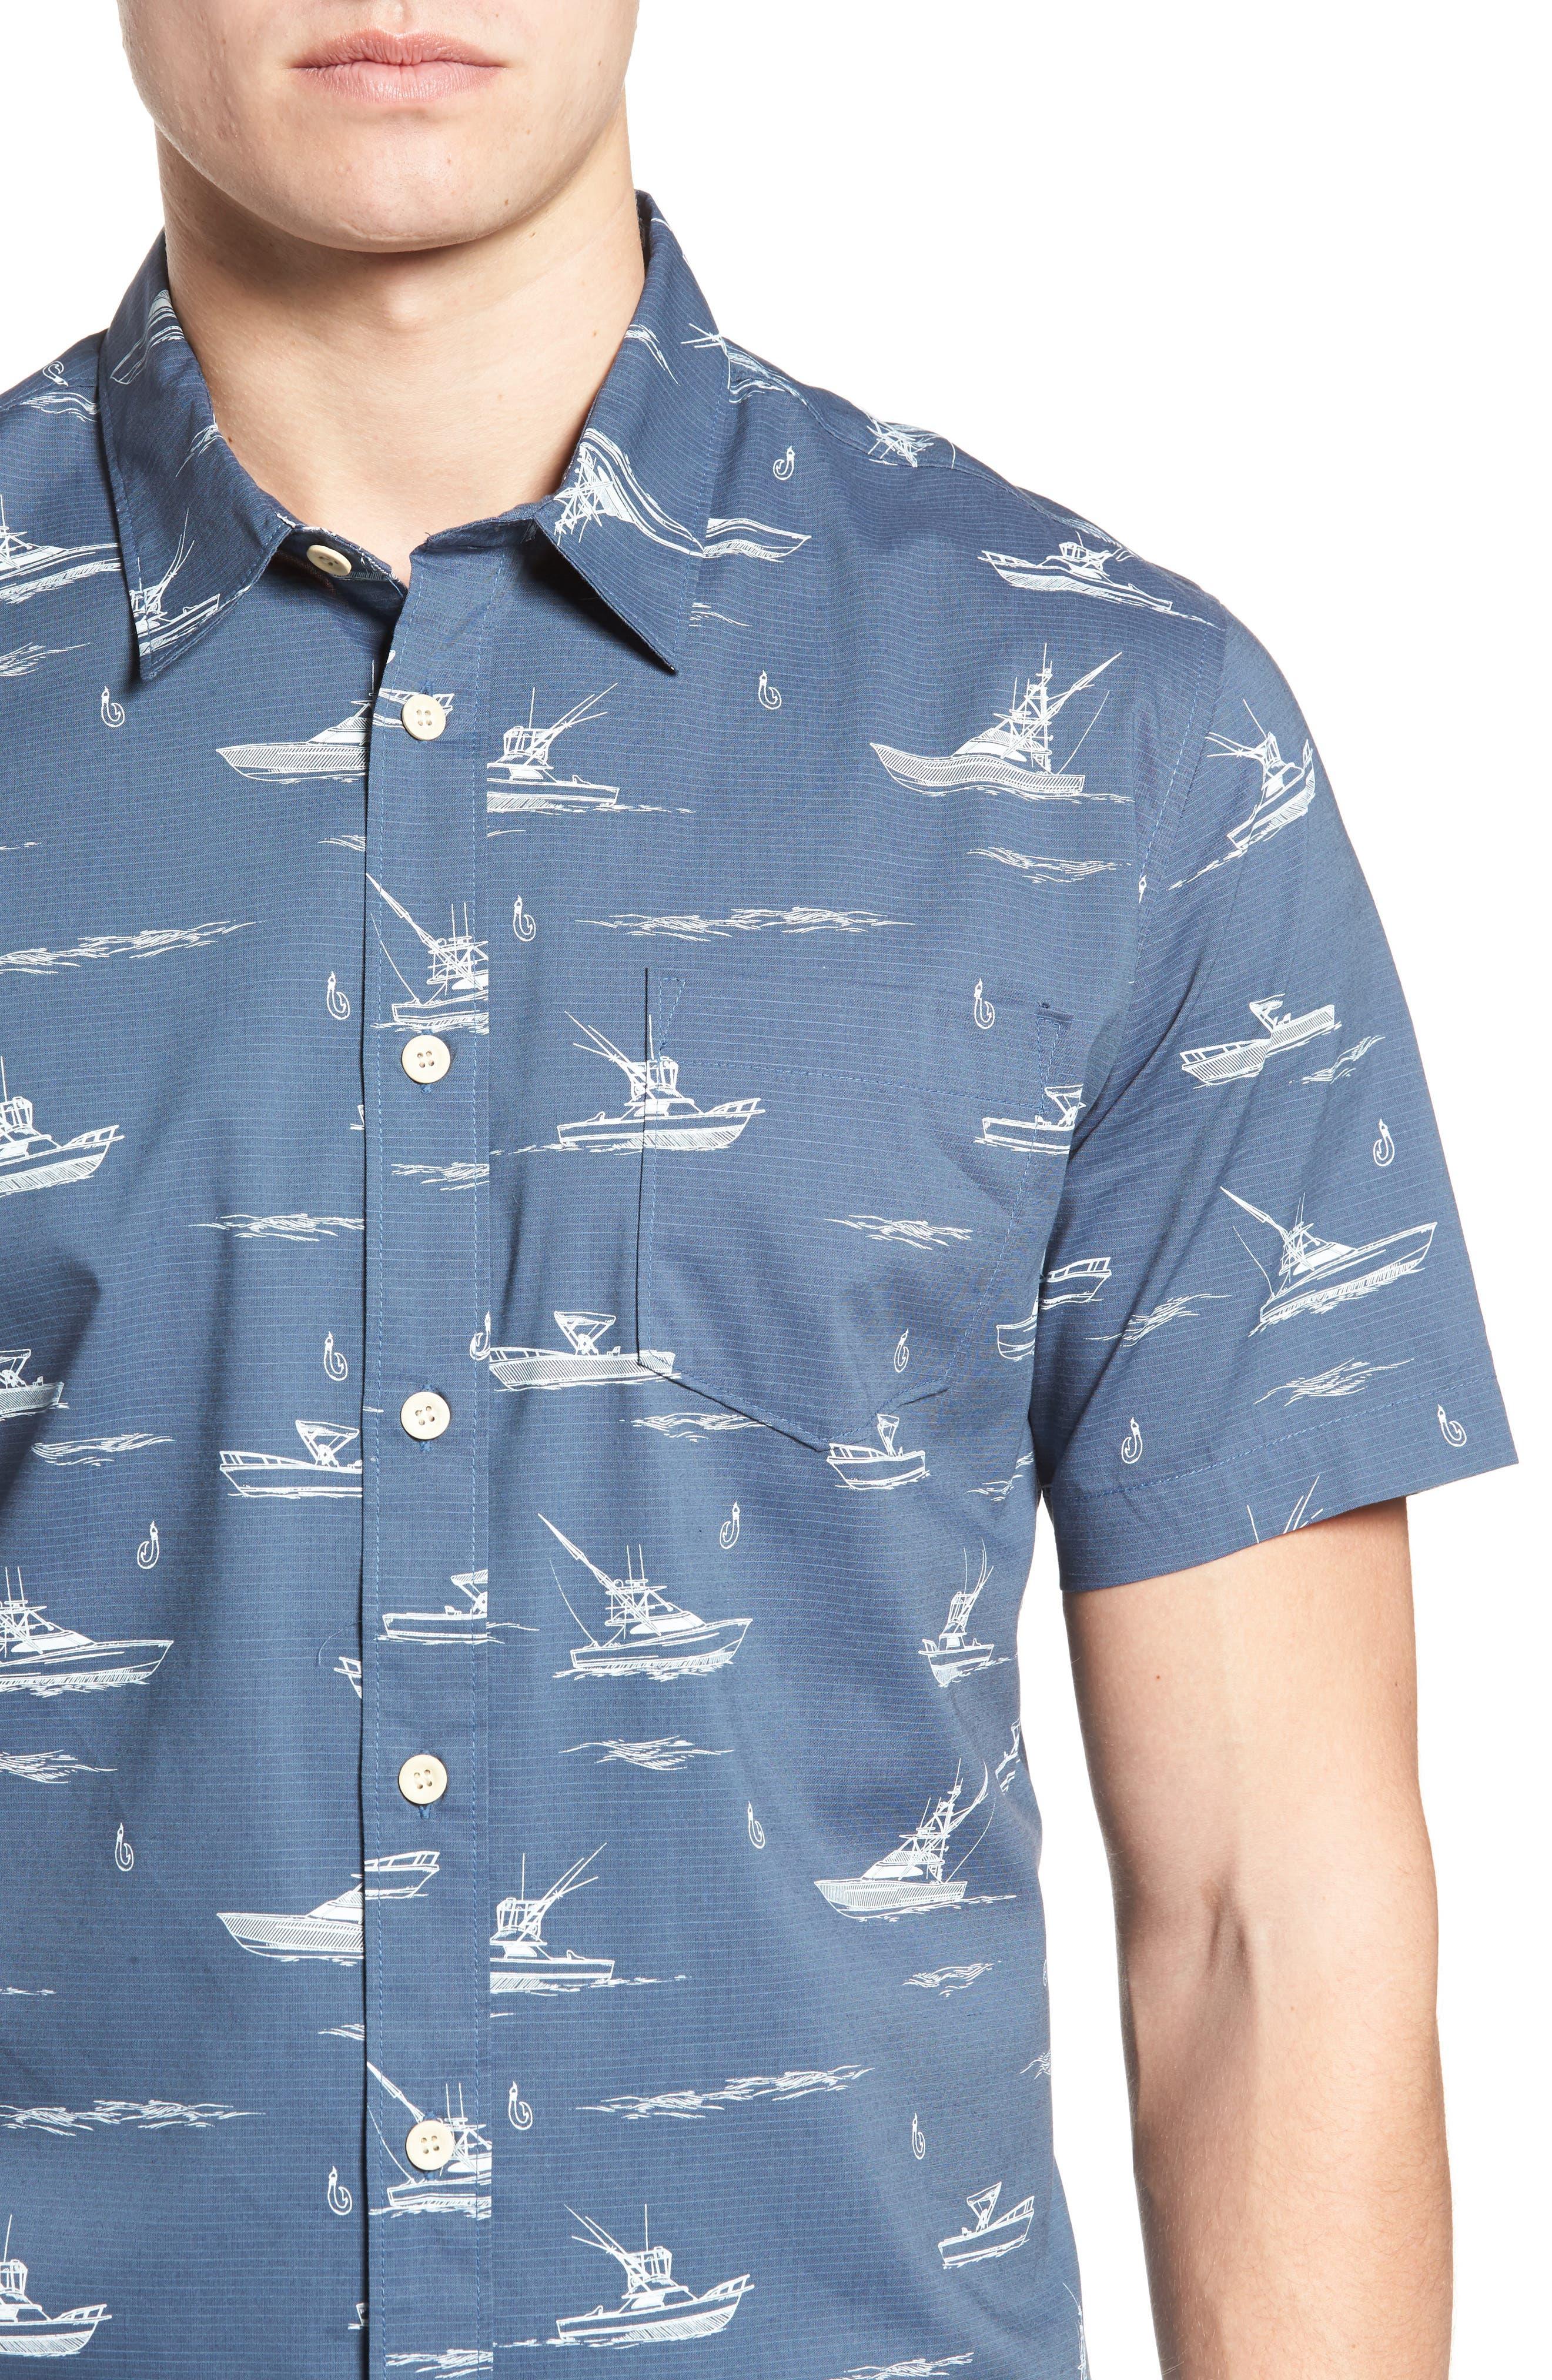 Fishboats Sport Shirt,                             Alternate thumbnail 5, color,